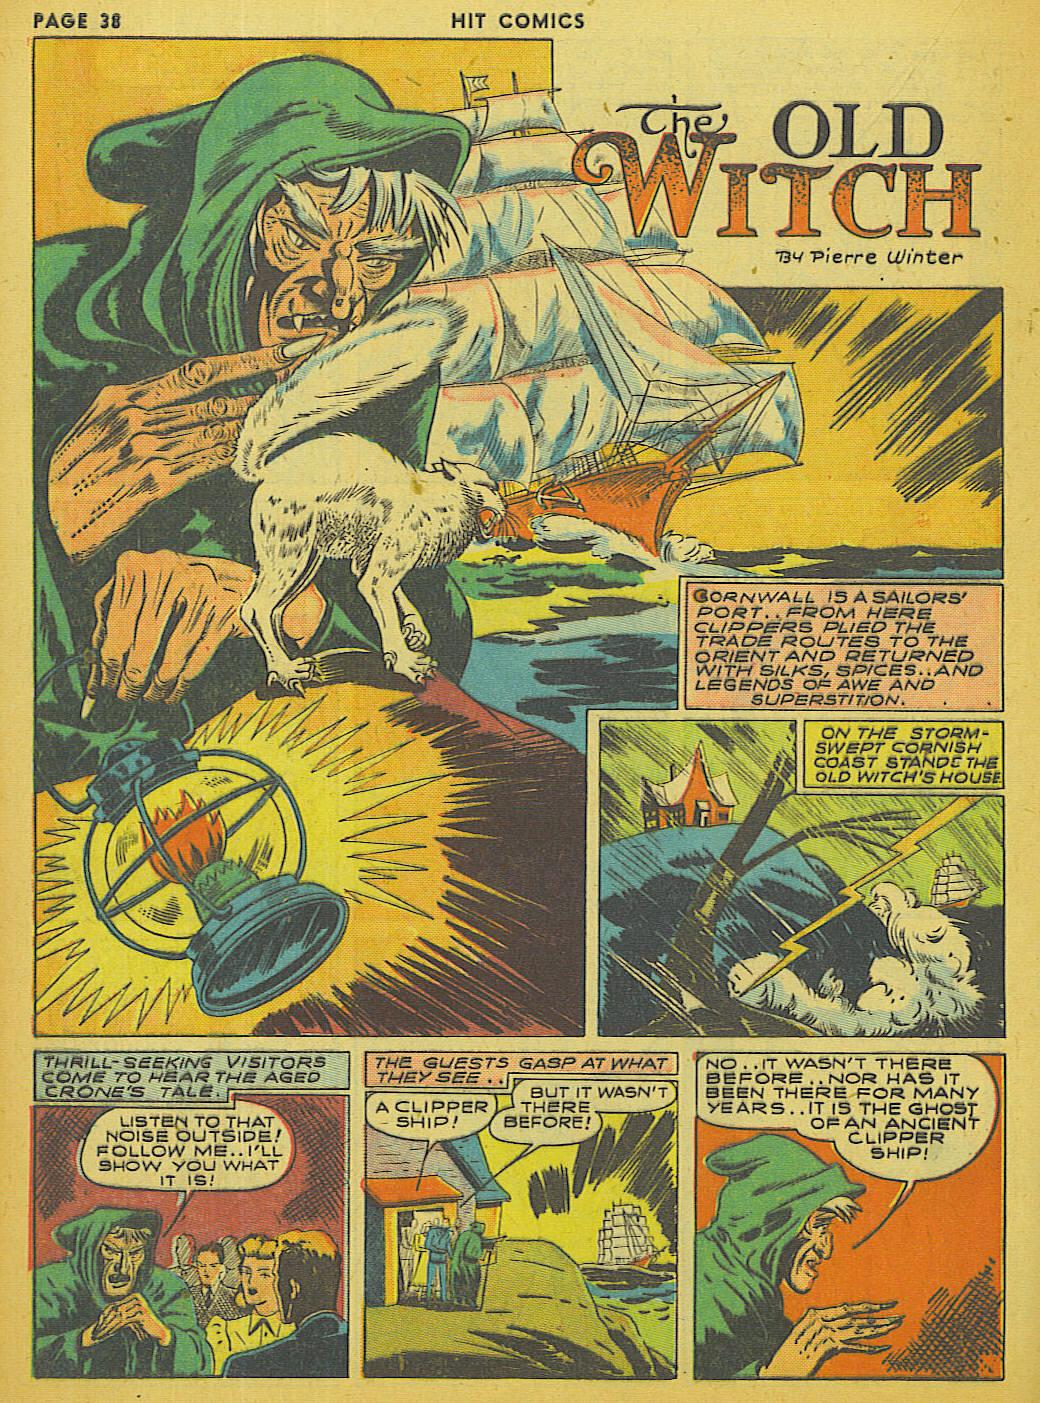 Read online Hit Comics comic -  Issue #13 - 40